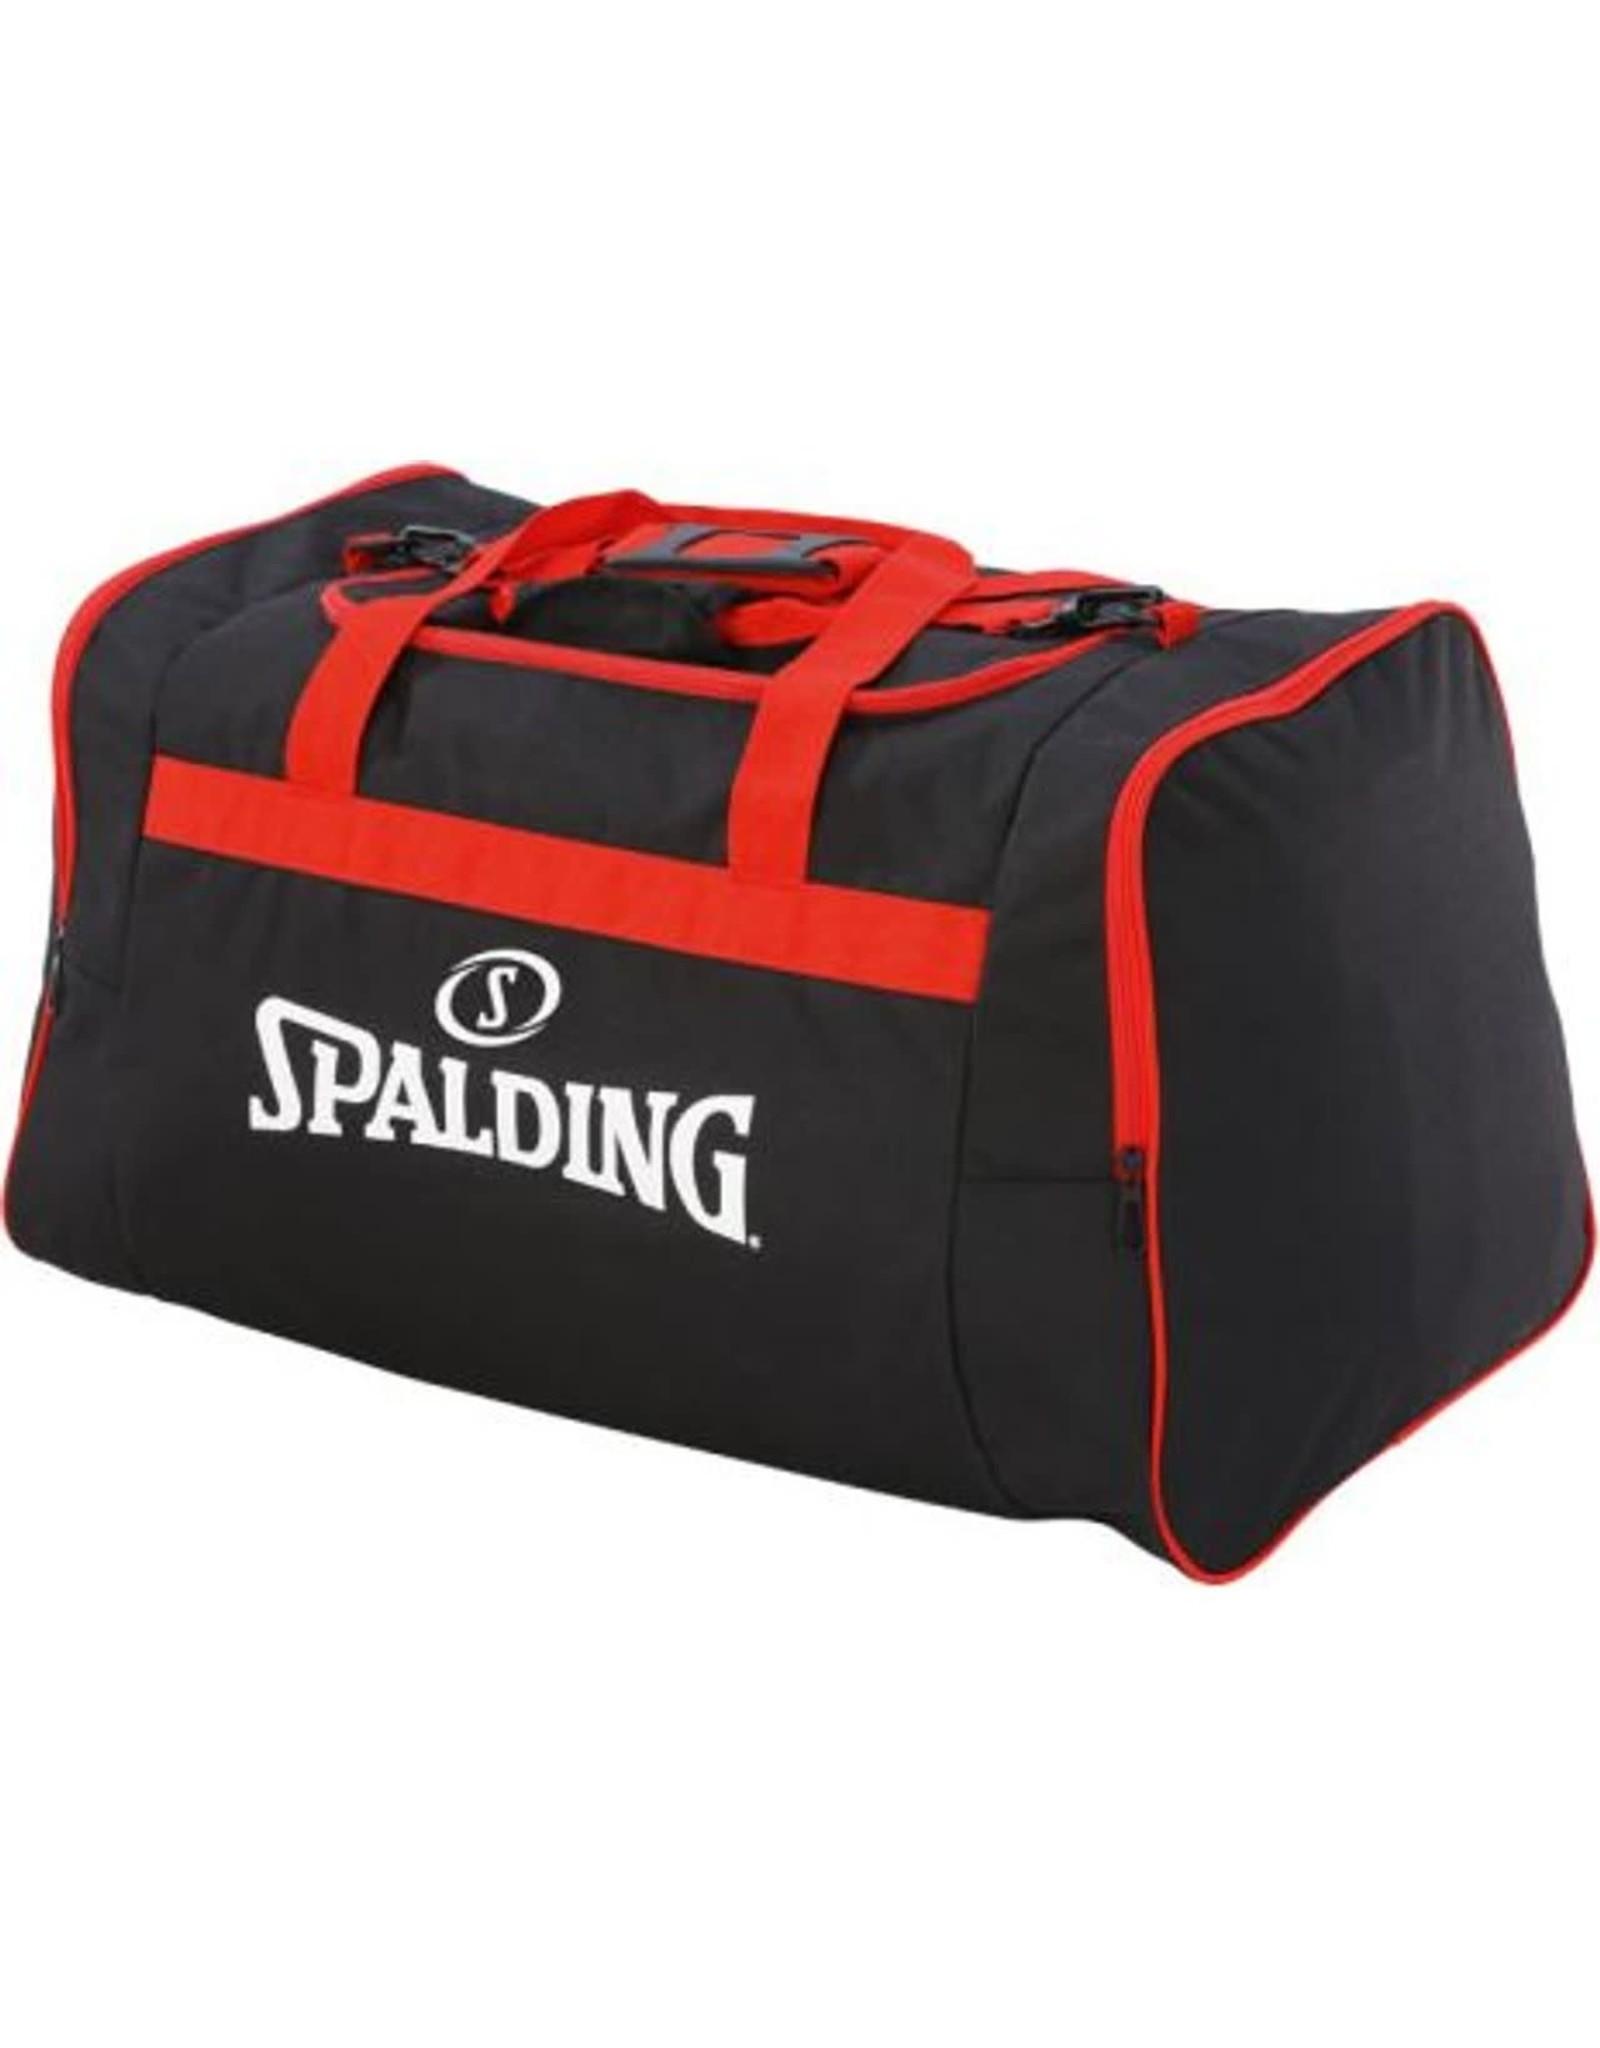 Spalding TEAM BAG MEDIUM